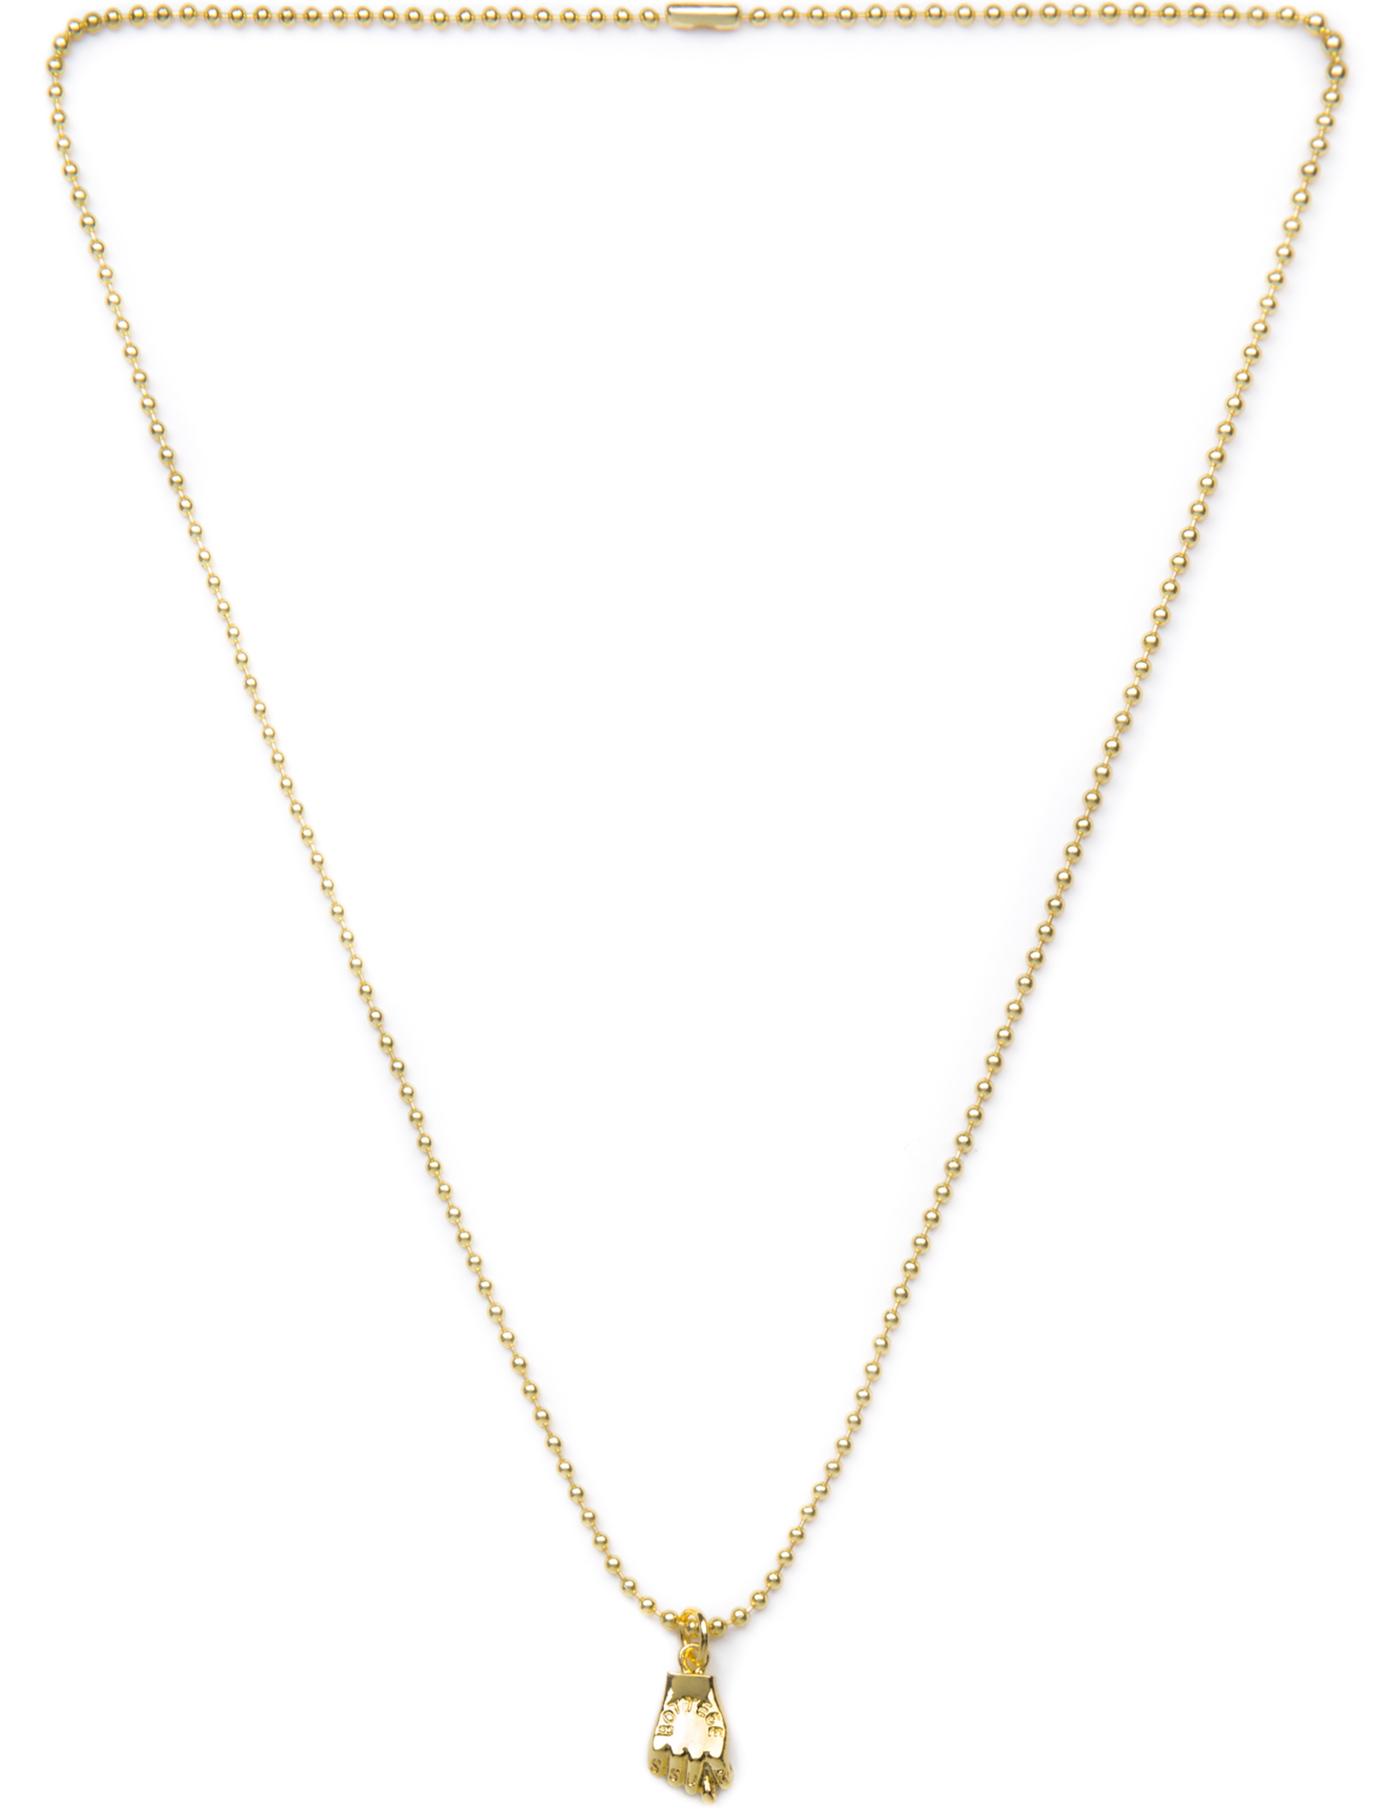 Ssur Caviar Cartel Gold Figa Fist Necklace Hypebeast Store